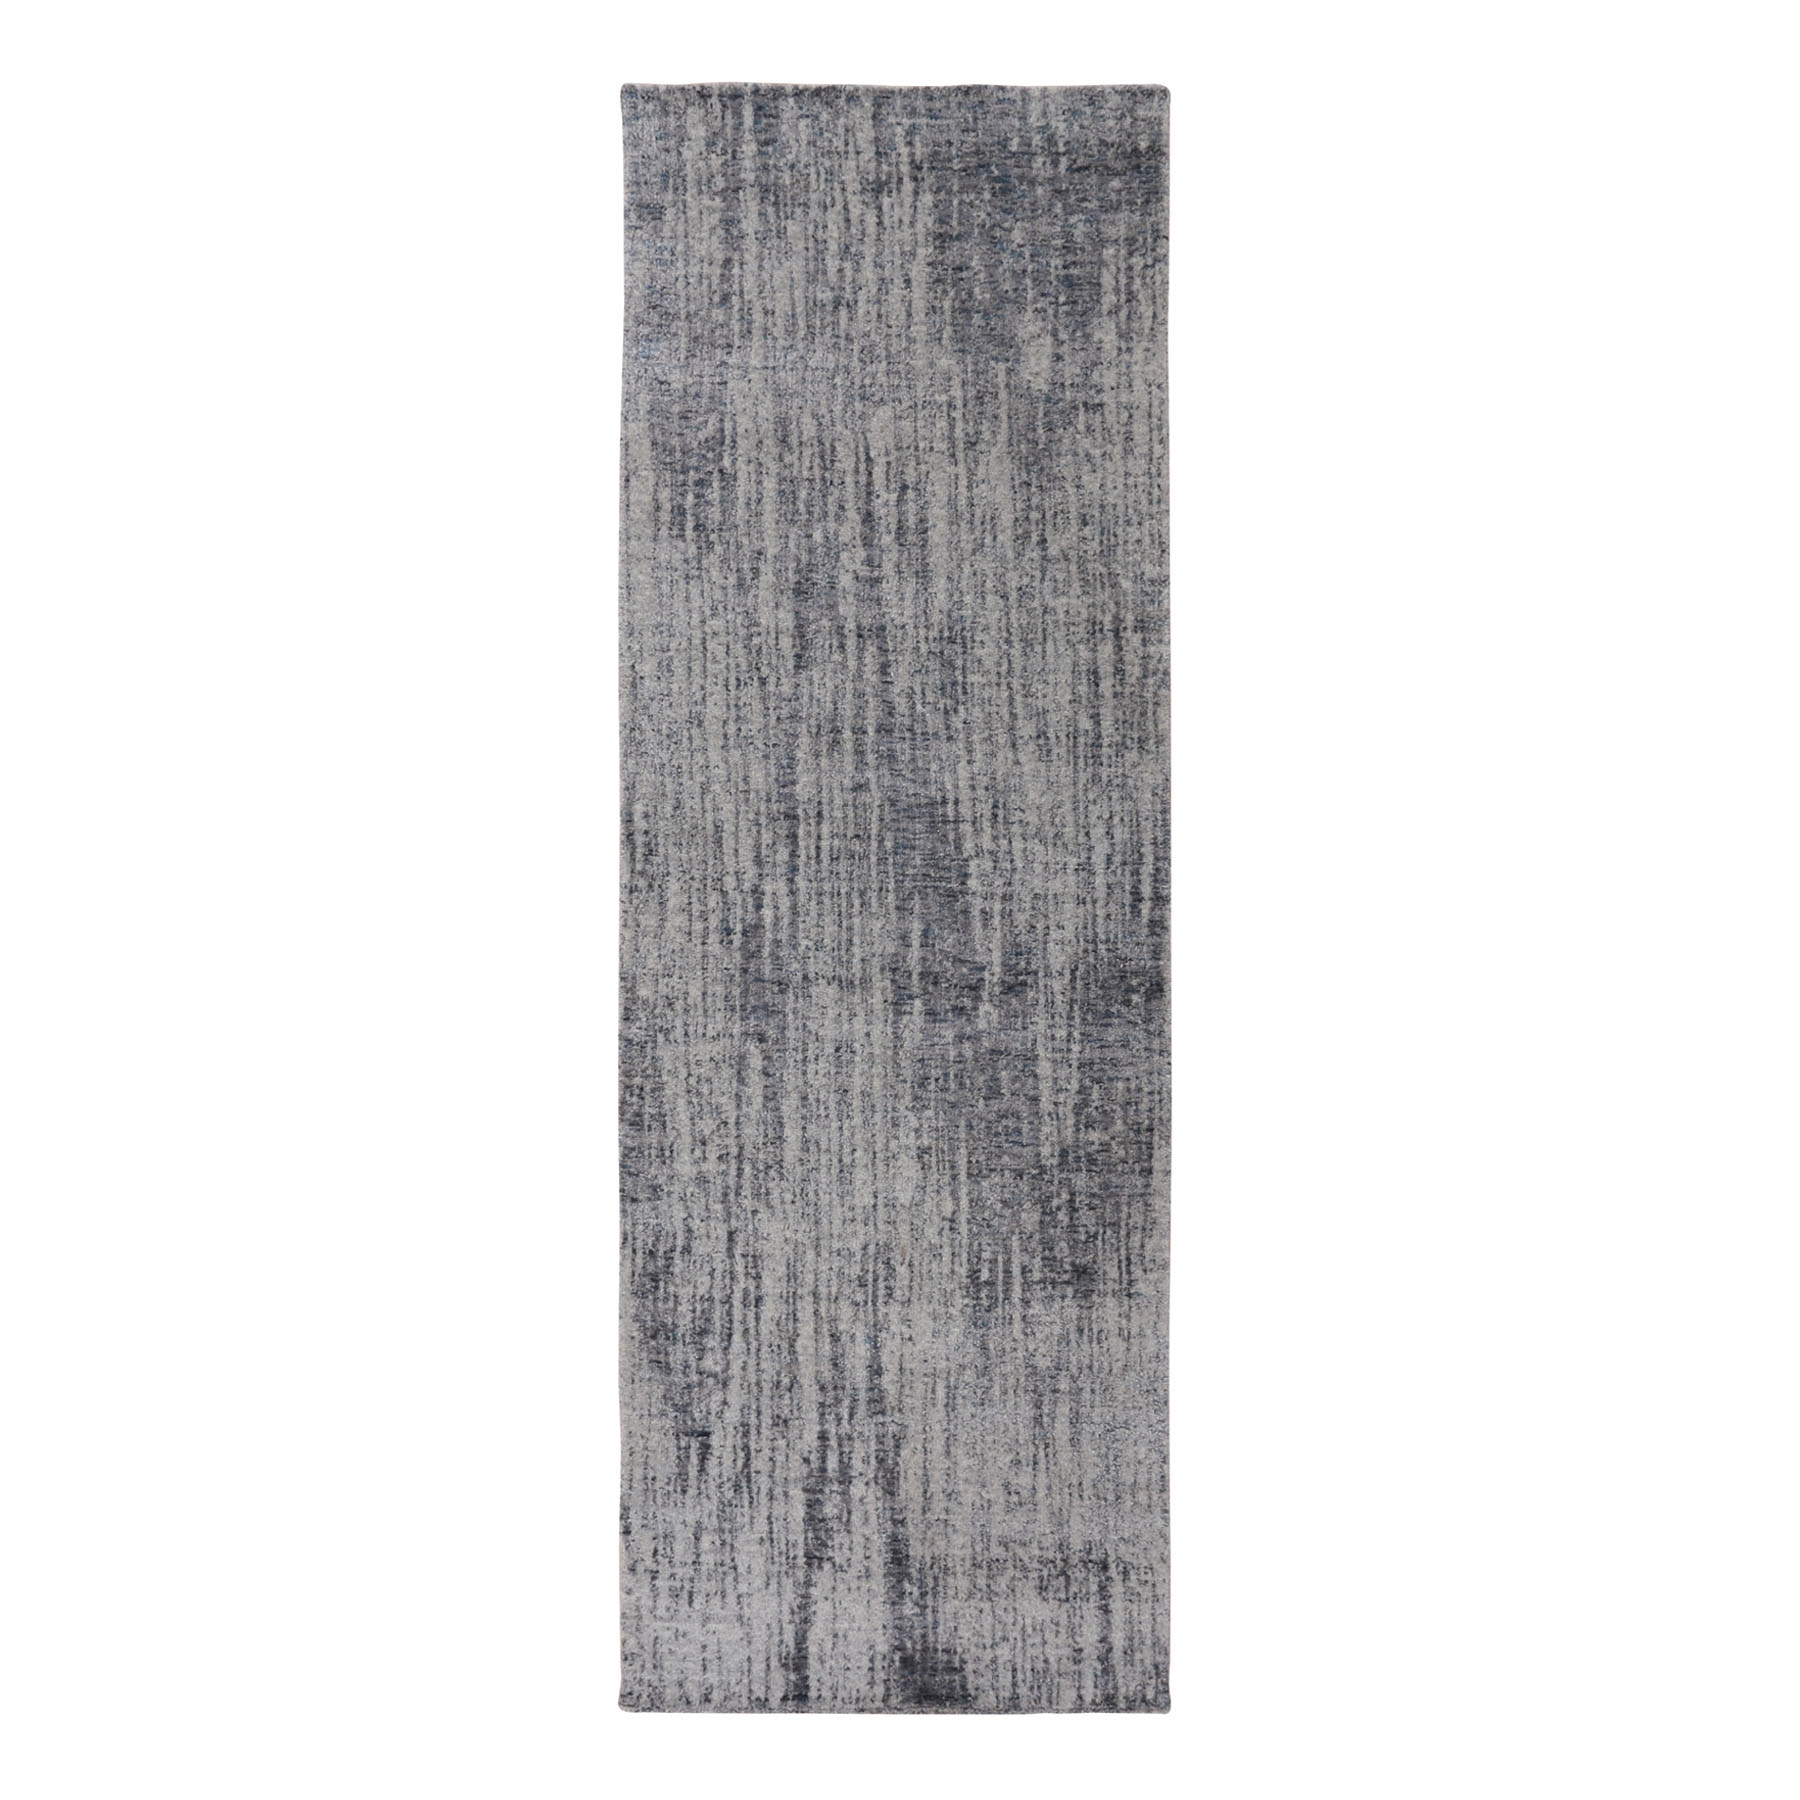 "2'5""X7'10"" Gray Fine Jacquard Hand Loomed Modern Wool And Art Silk Runner Oriental Rug moae80a0"